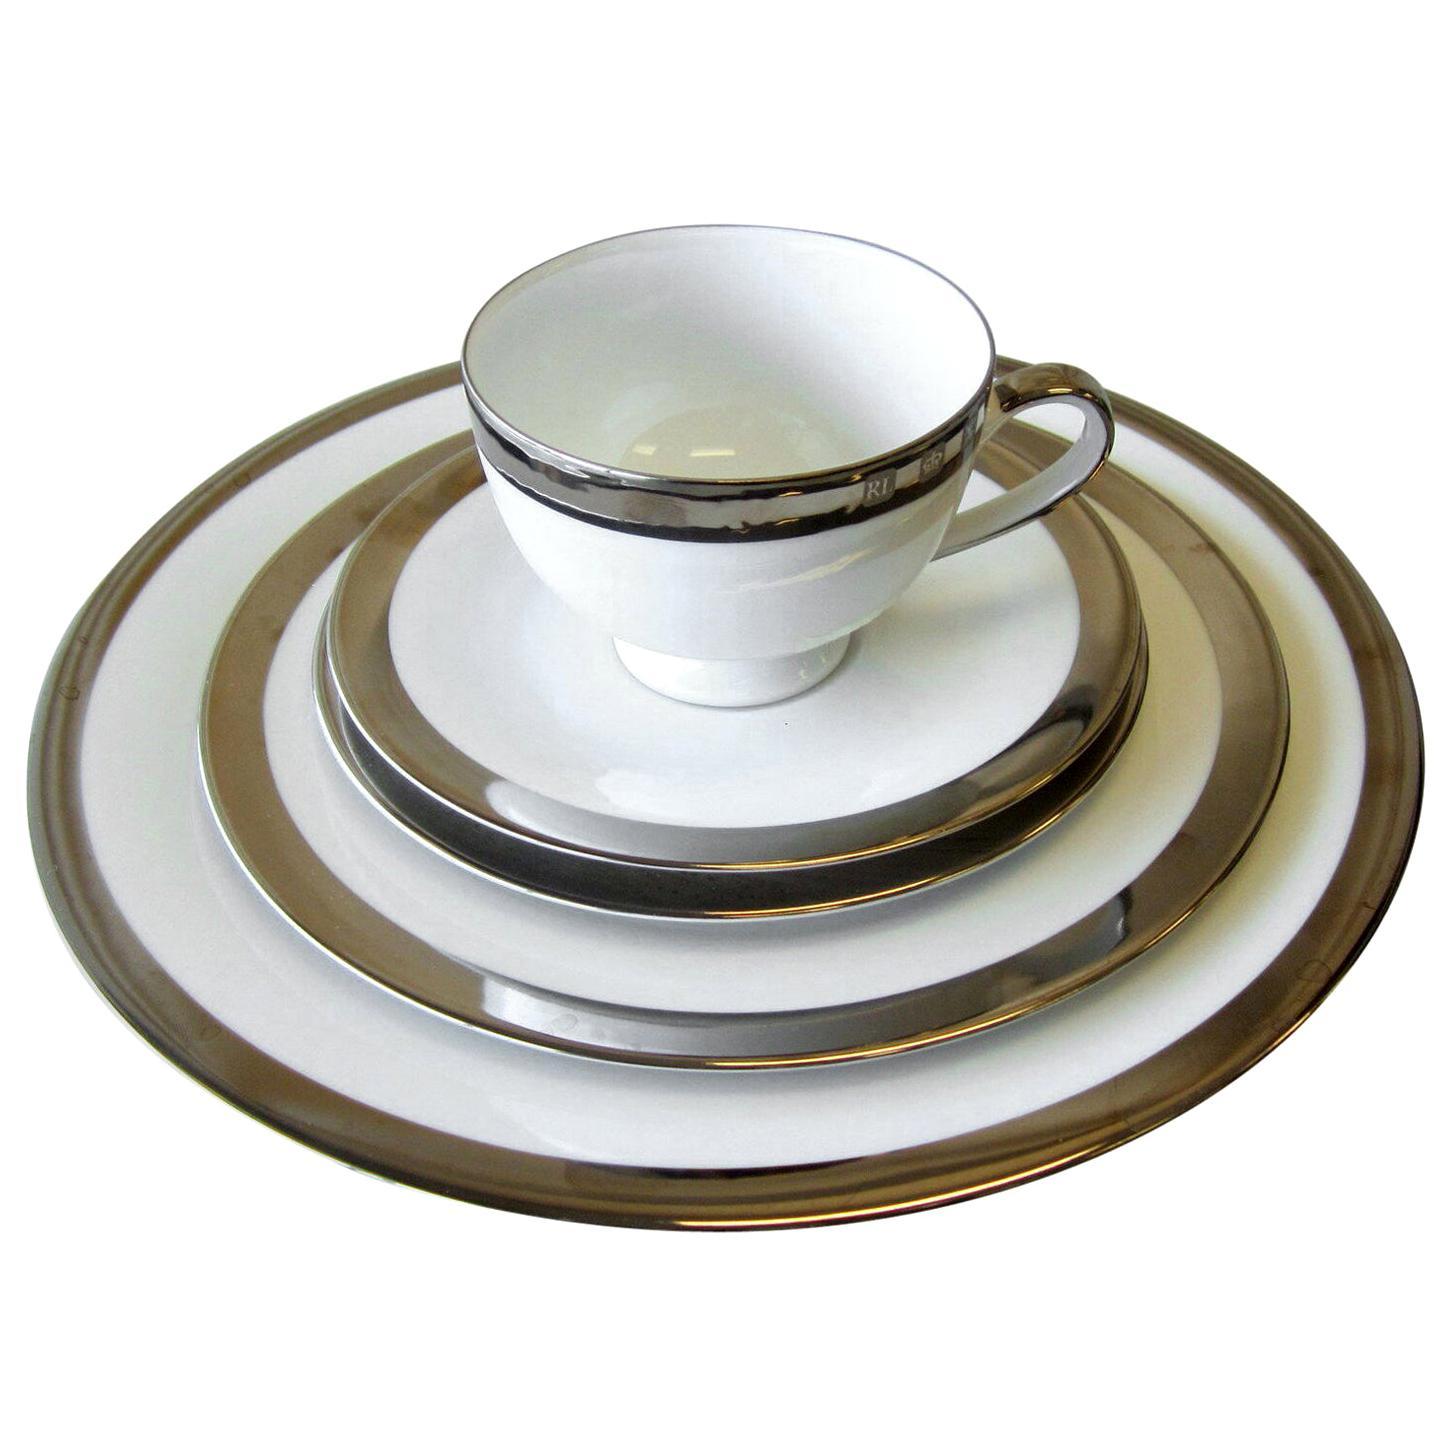 Ralph Lauren Academy Platinum Dinnerware, Set of 12 Place Settings